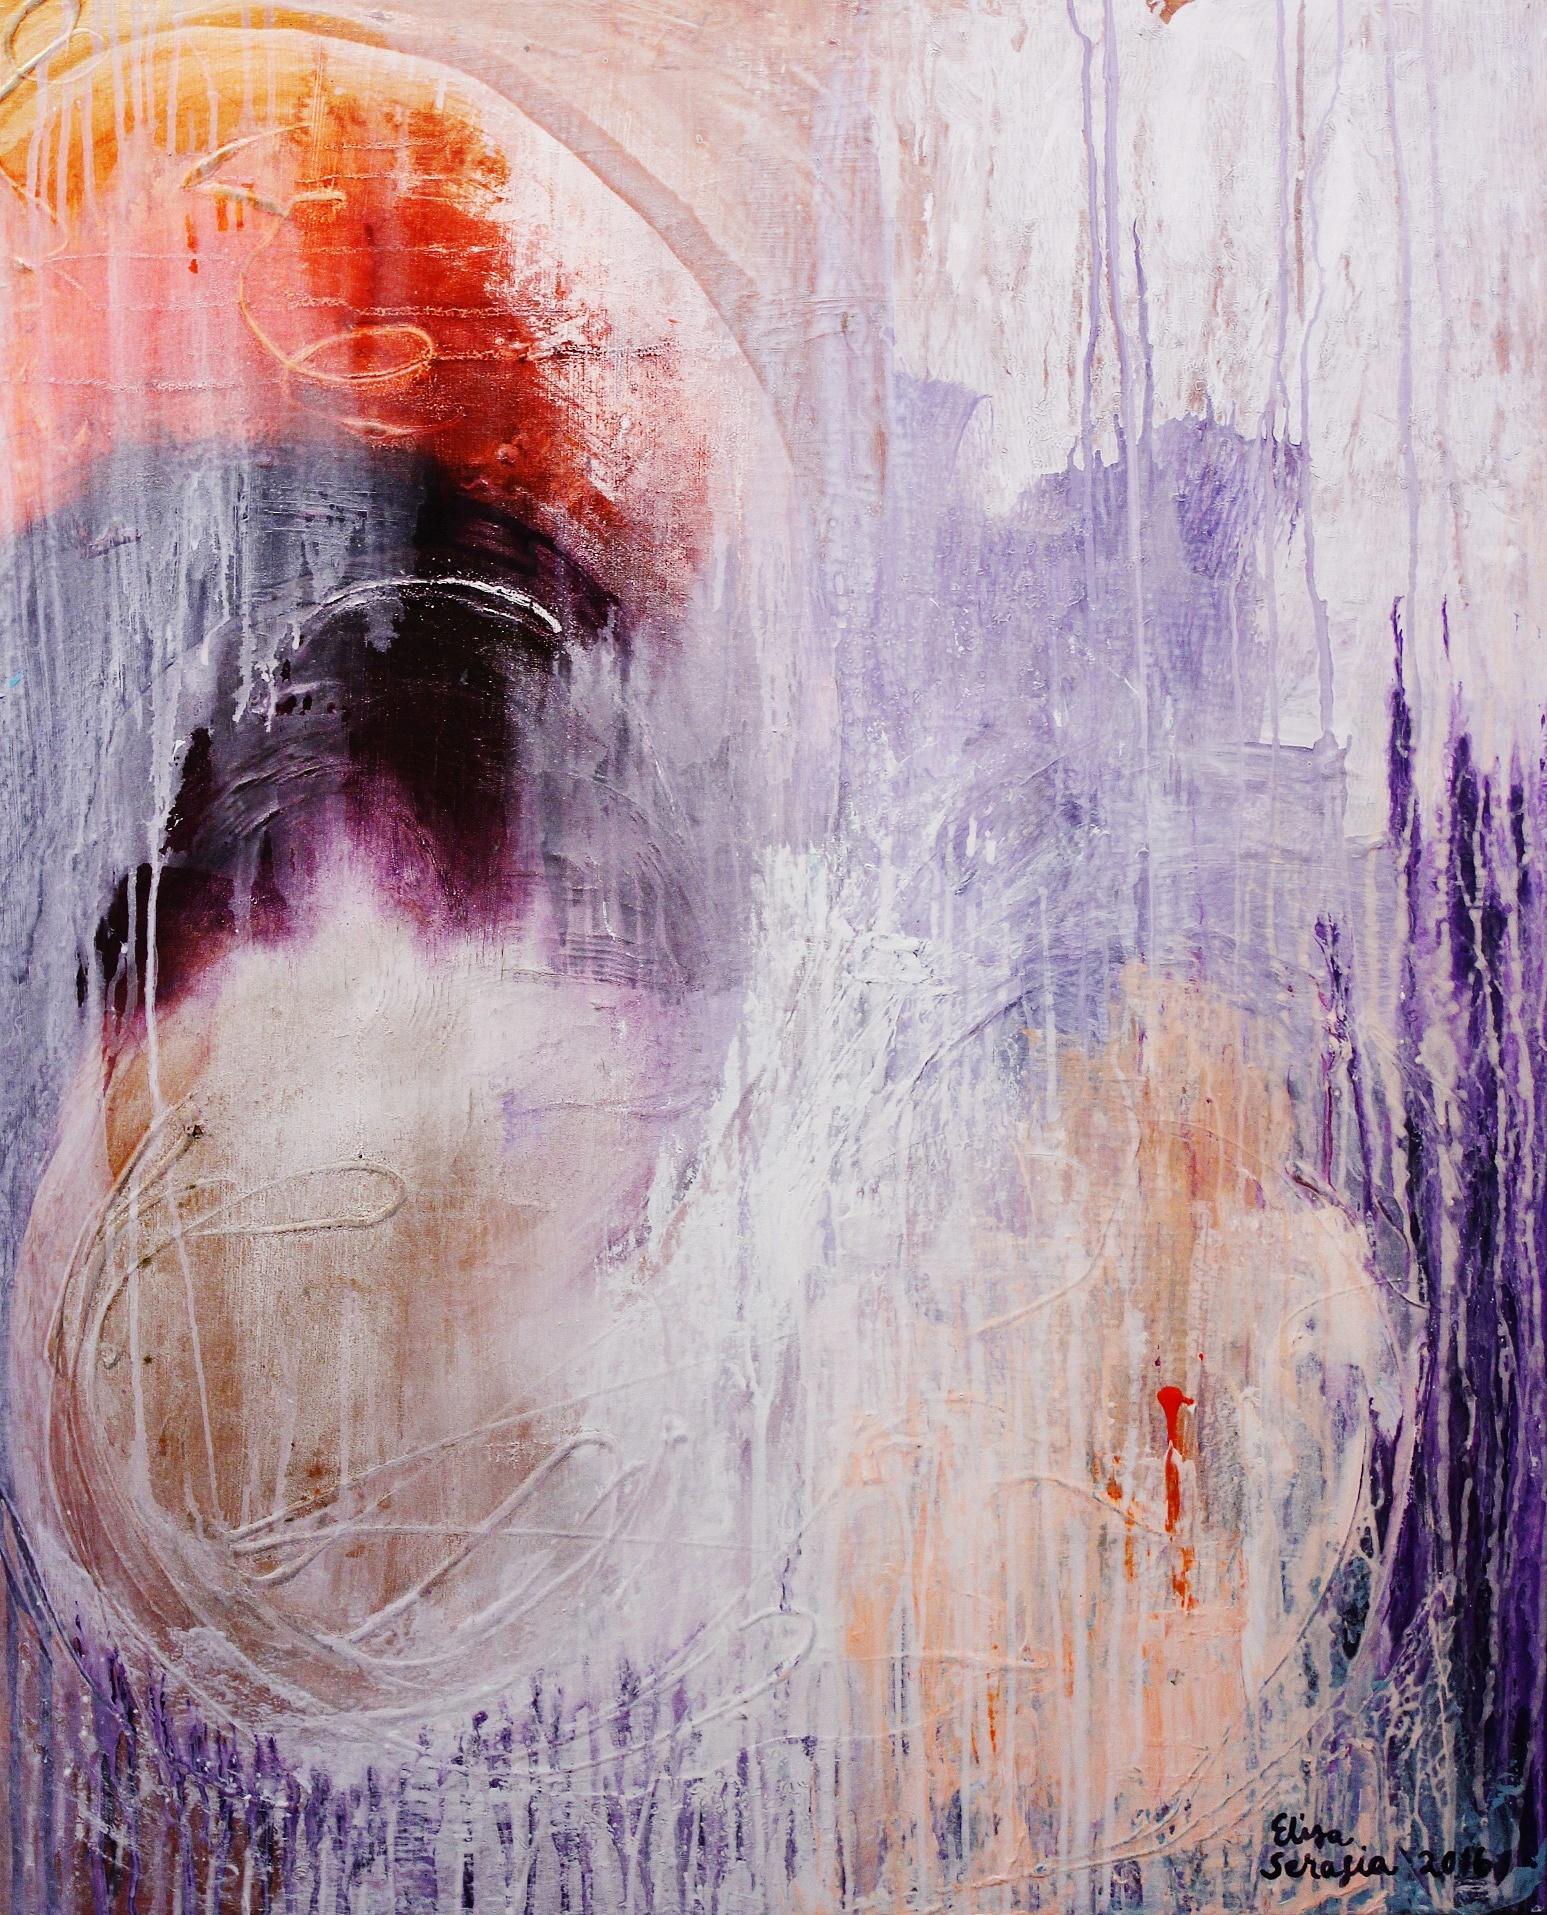 Rauhan päivät, Akryyli kankaalle, 100 cm x 80 cm  Myyty / Sold